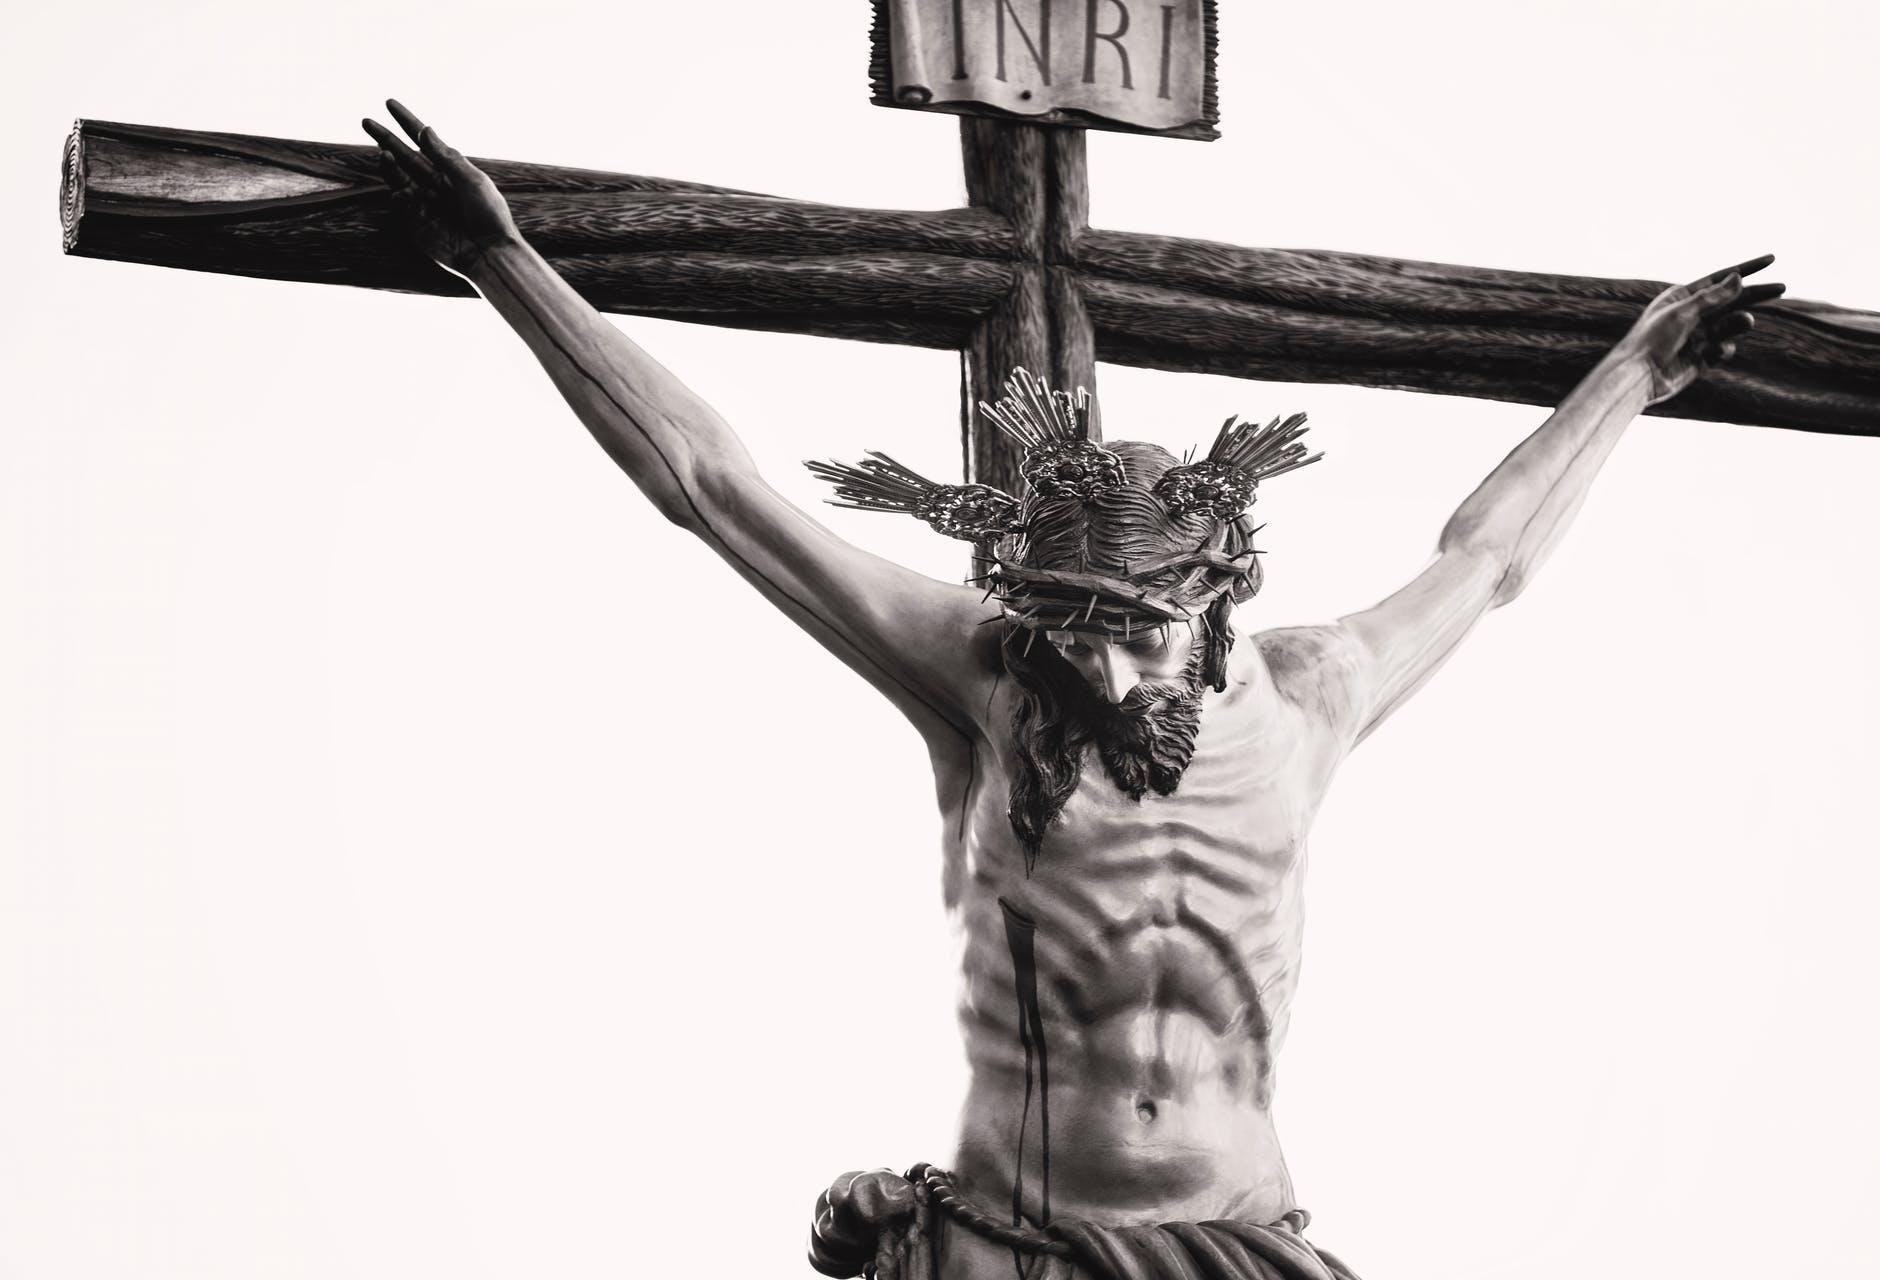 Today's Prayer: April 5, 2020